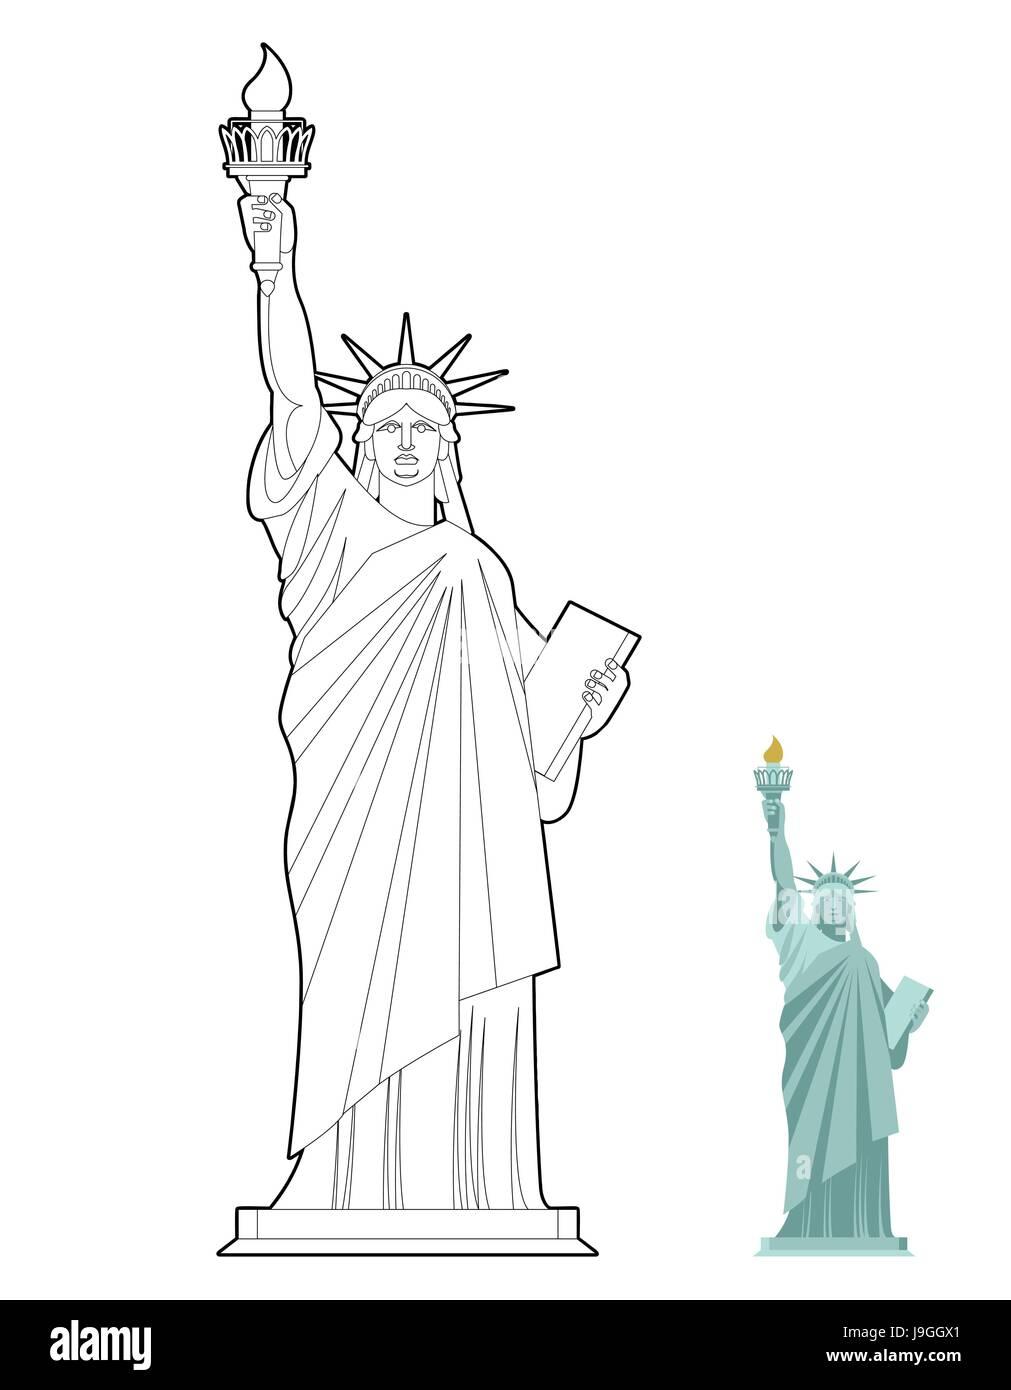 Contemporáneo Estados Unidos Colorear Libro Motivo - Dibujos Para ...